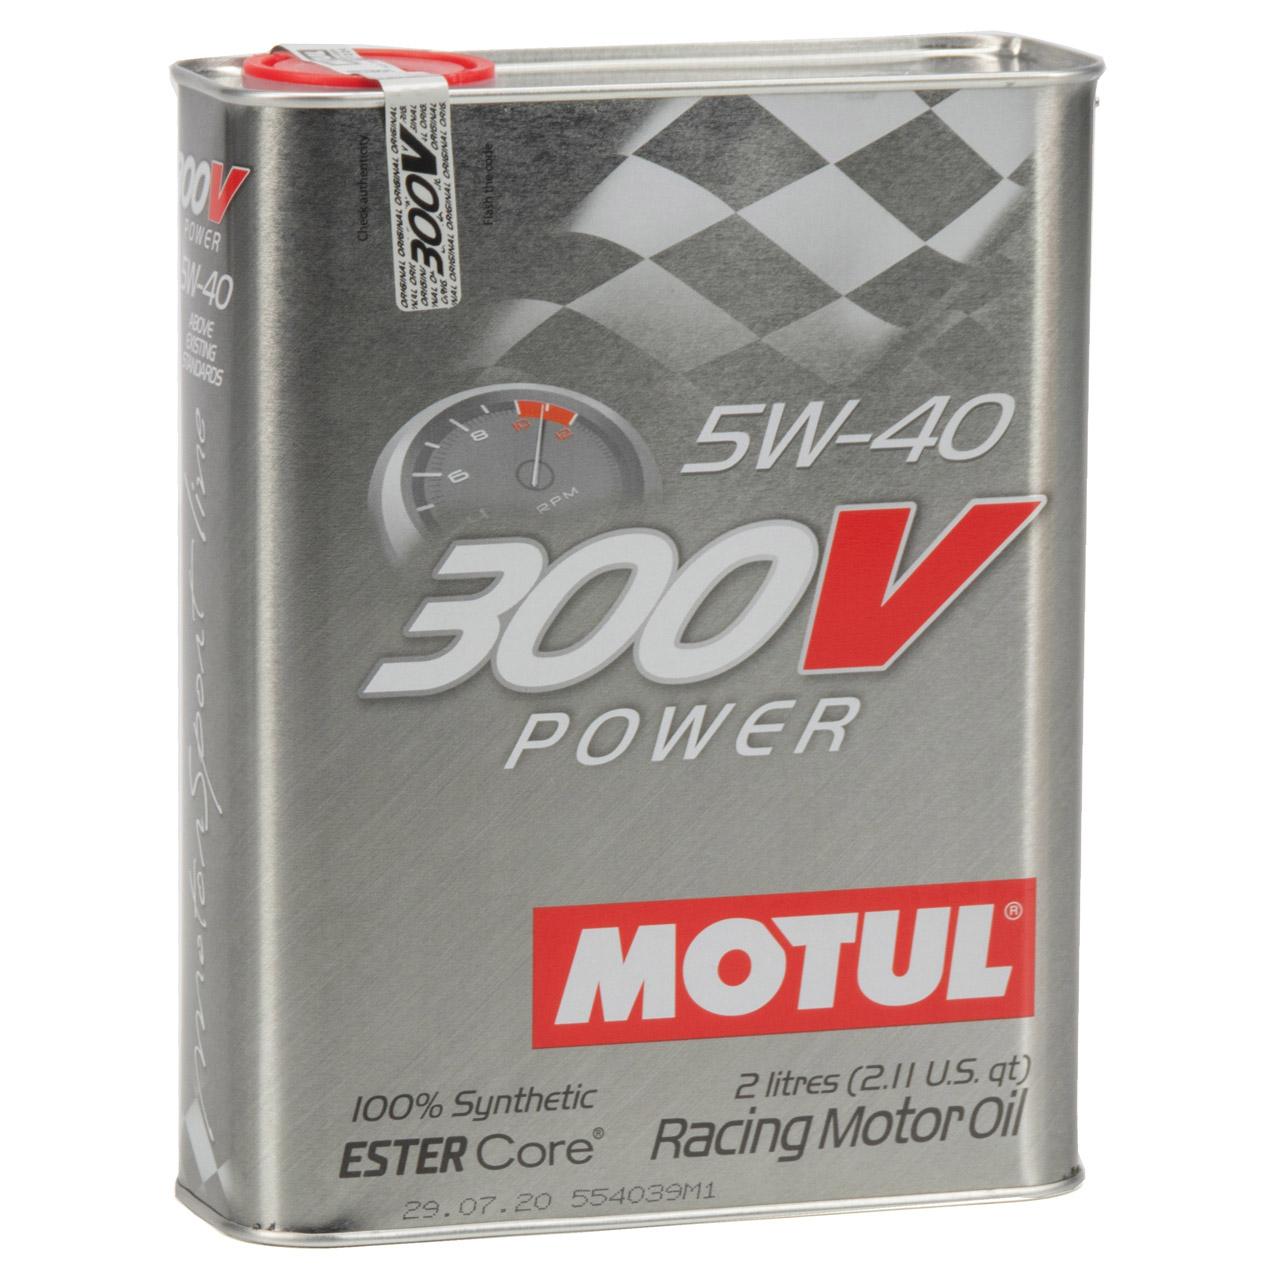 MOTUL 300V POWER RACING Motoröl Öl 5W40 100% Synthetic Ester Core - 8L 8 Liter